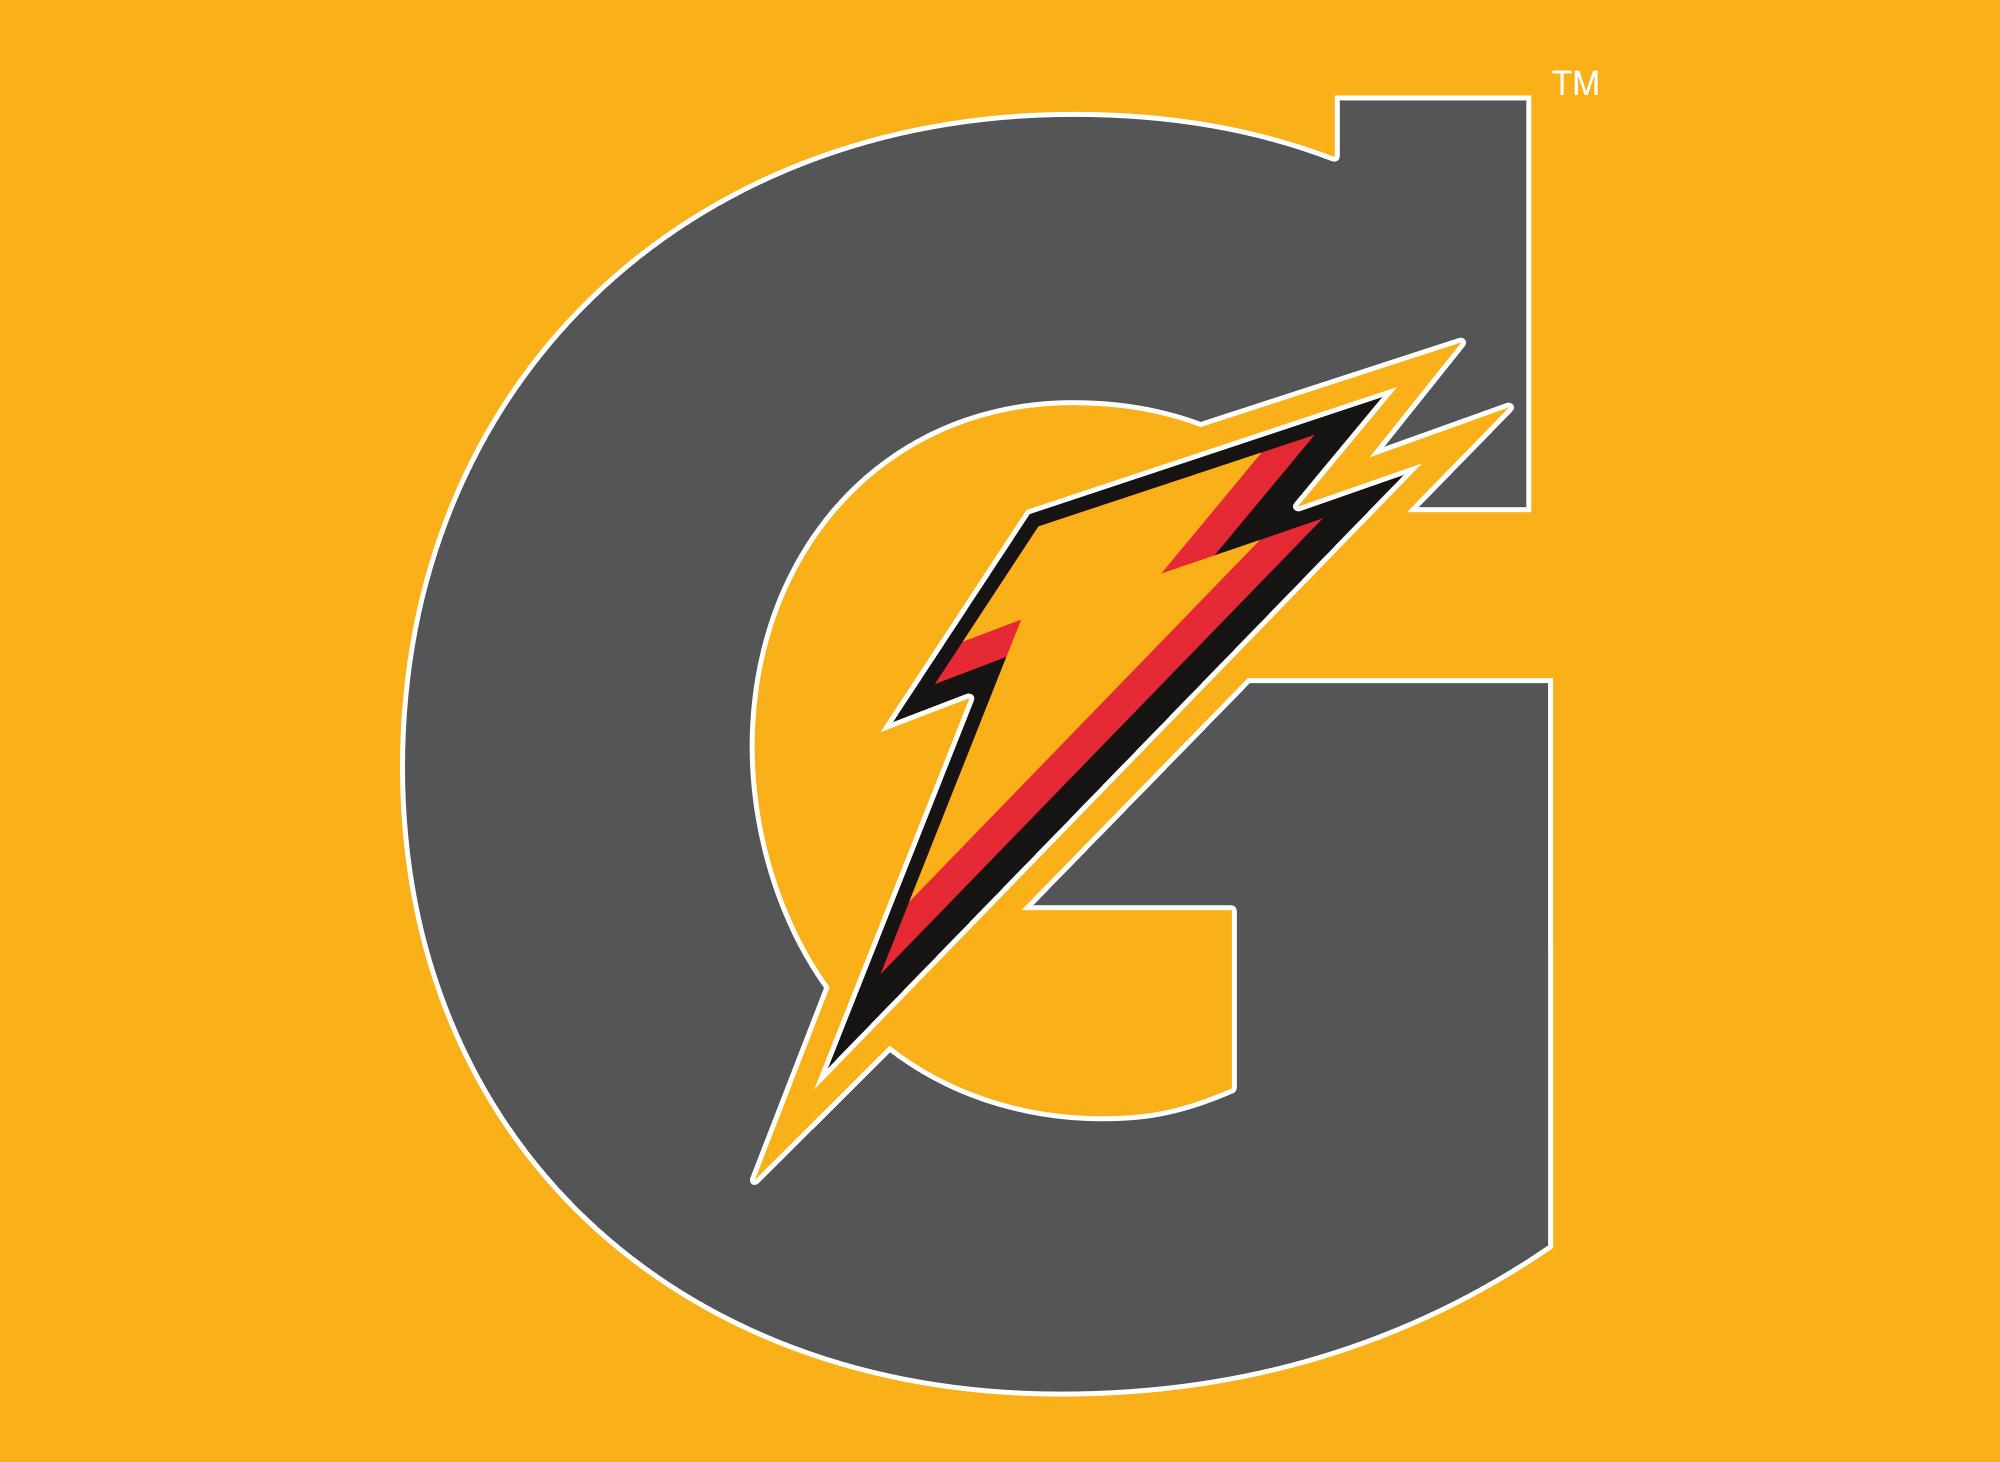 2000x1462 Gatorade Logo, Gatorade Symbol, Meaning, History And Evolution